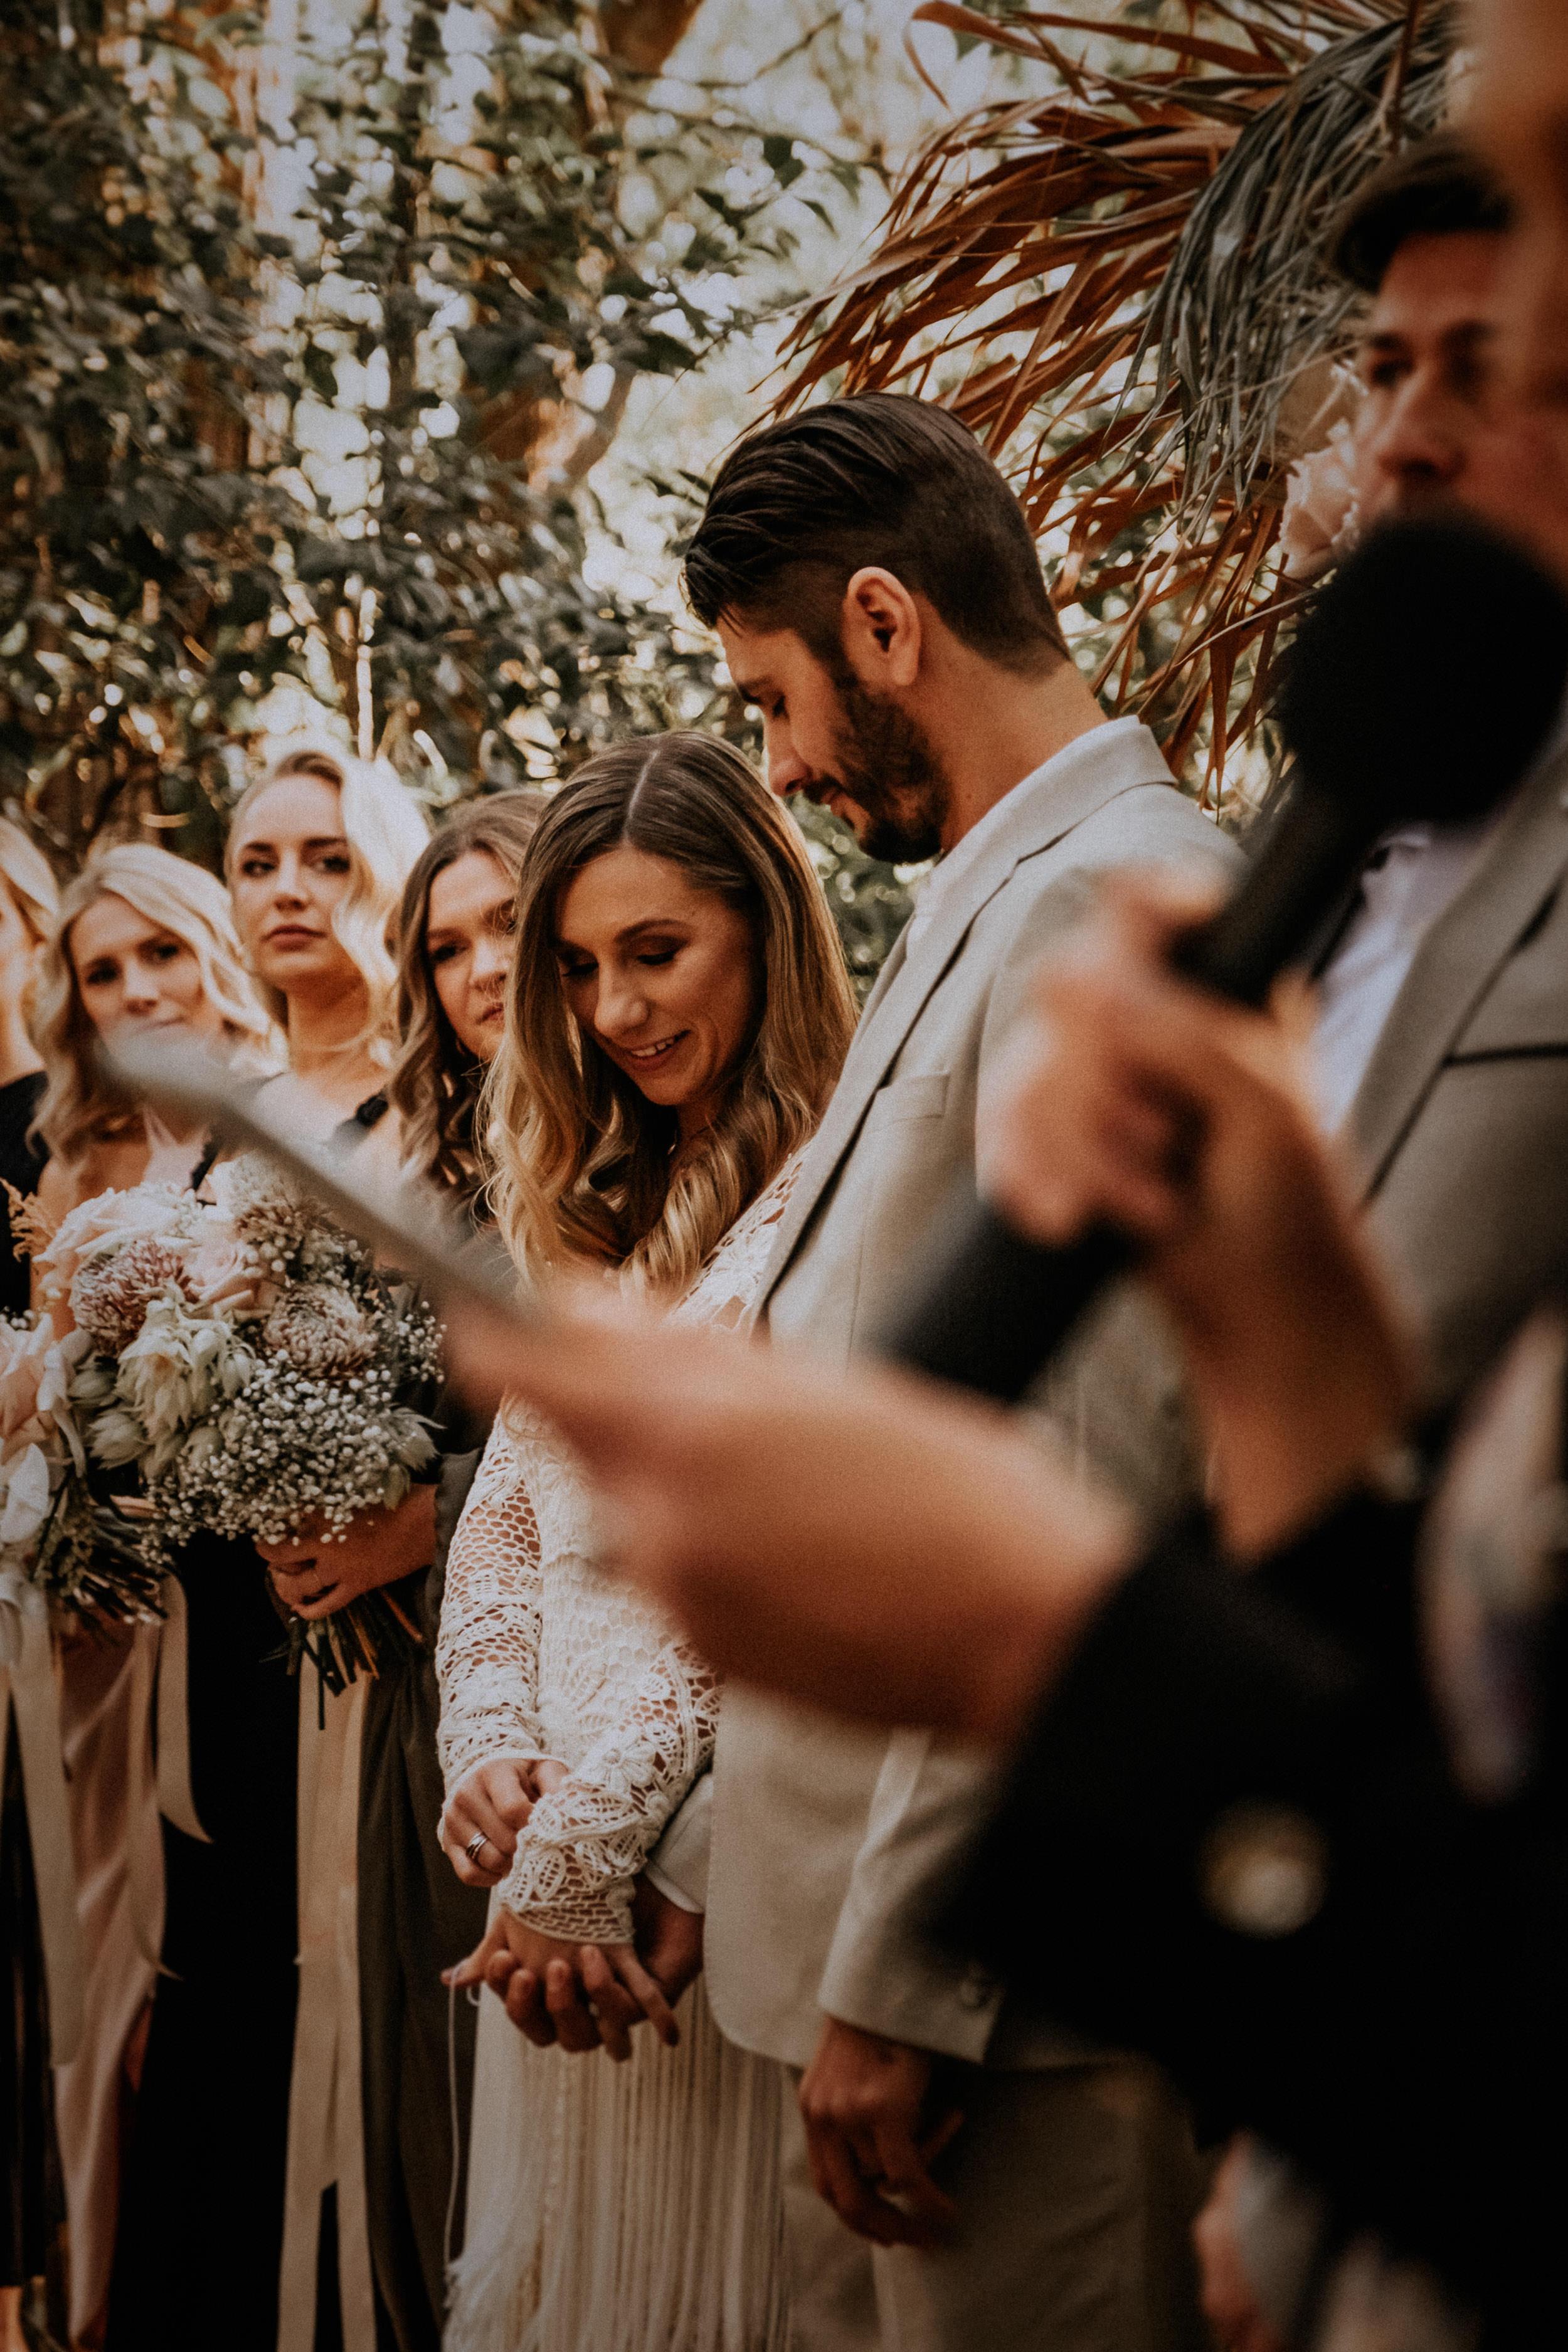 S&A Elopement - Kings & Thieves - Shred 'Til Dead - Central Coast Beach Forest Wedding - 236.jpg